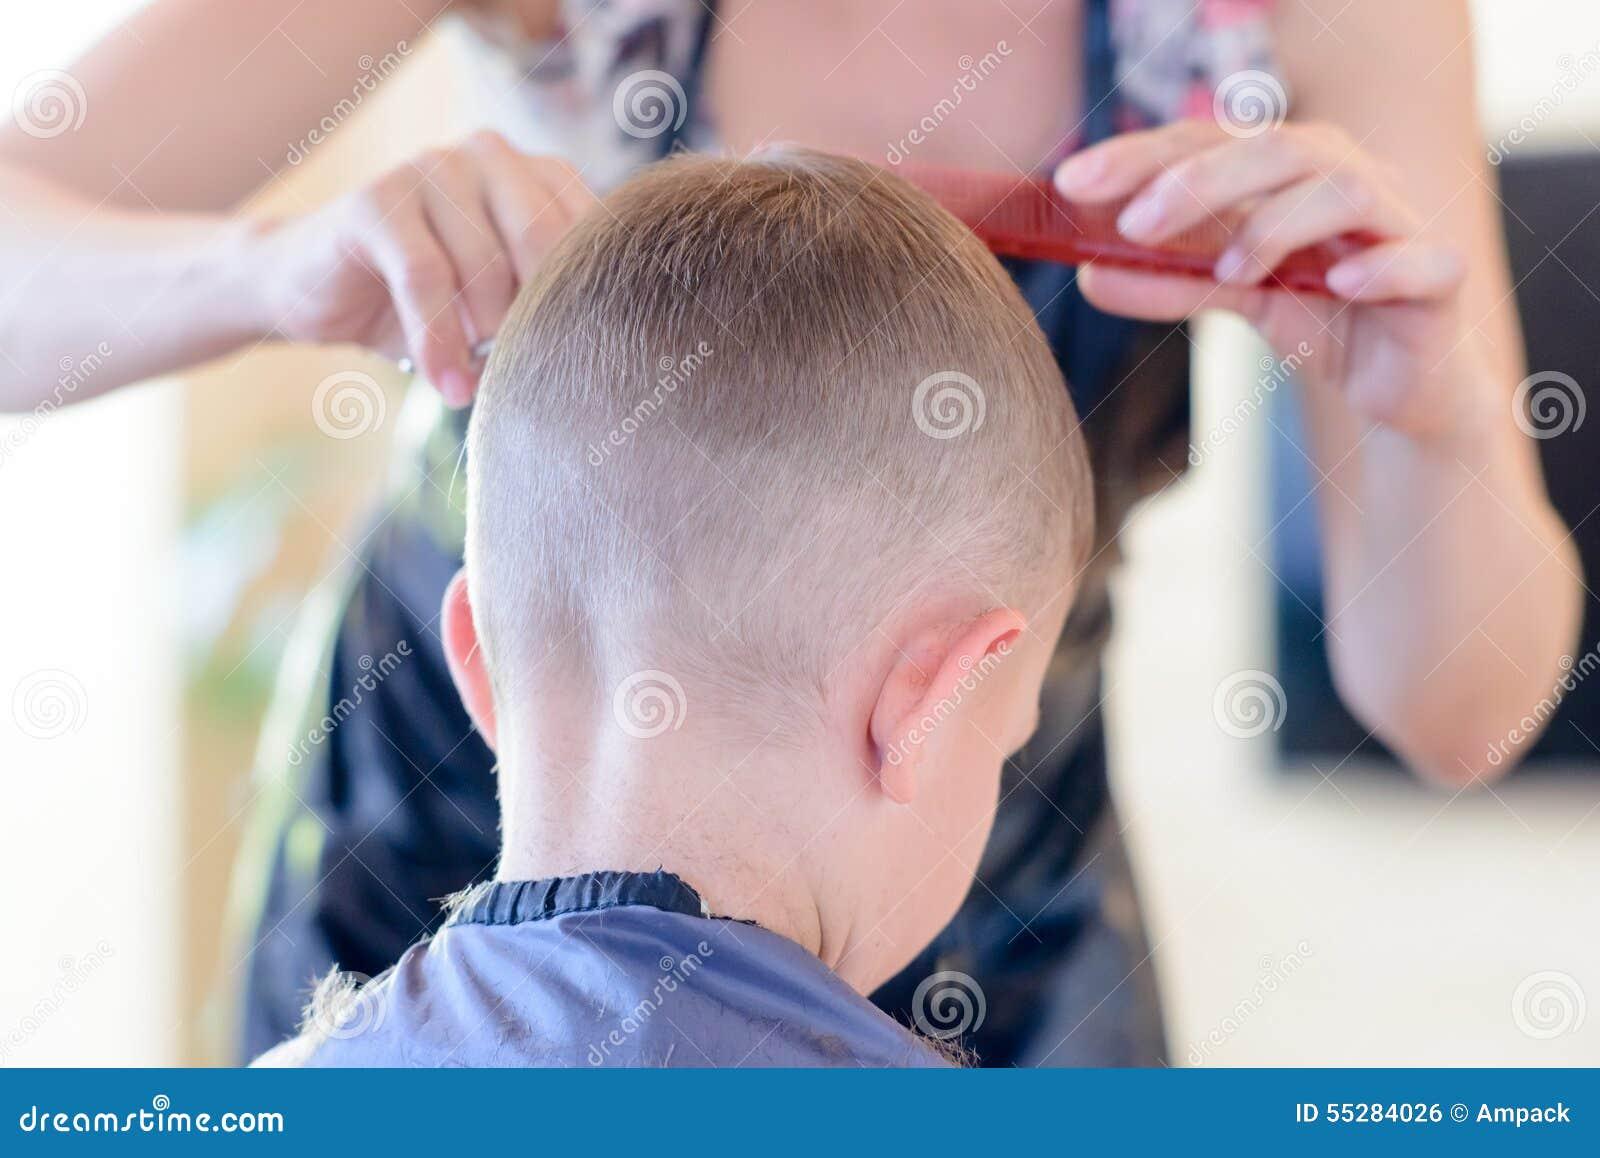 Young boys sawing and cumshots gay robert